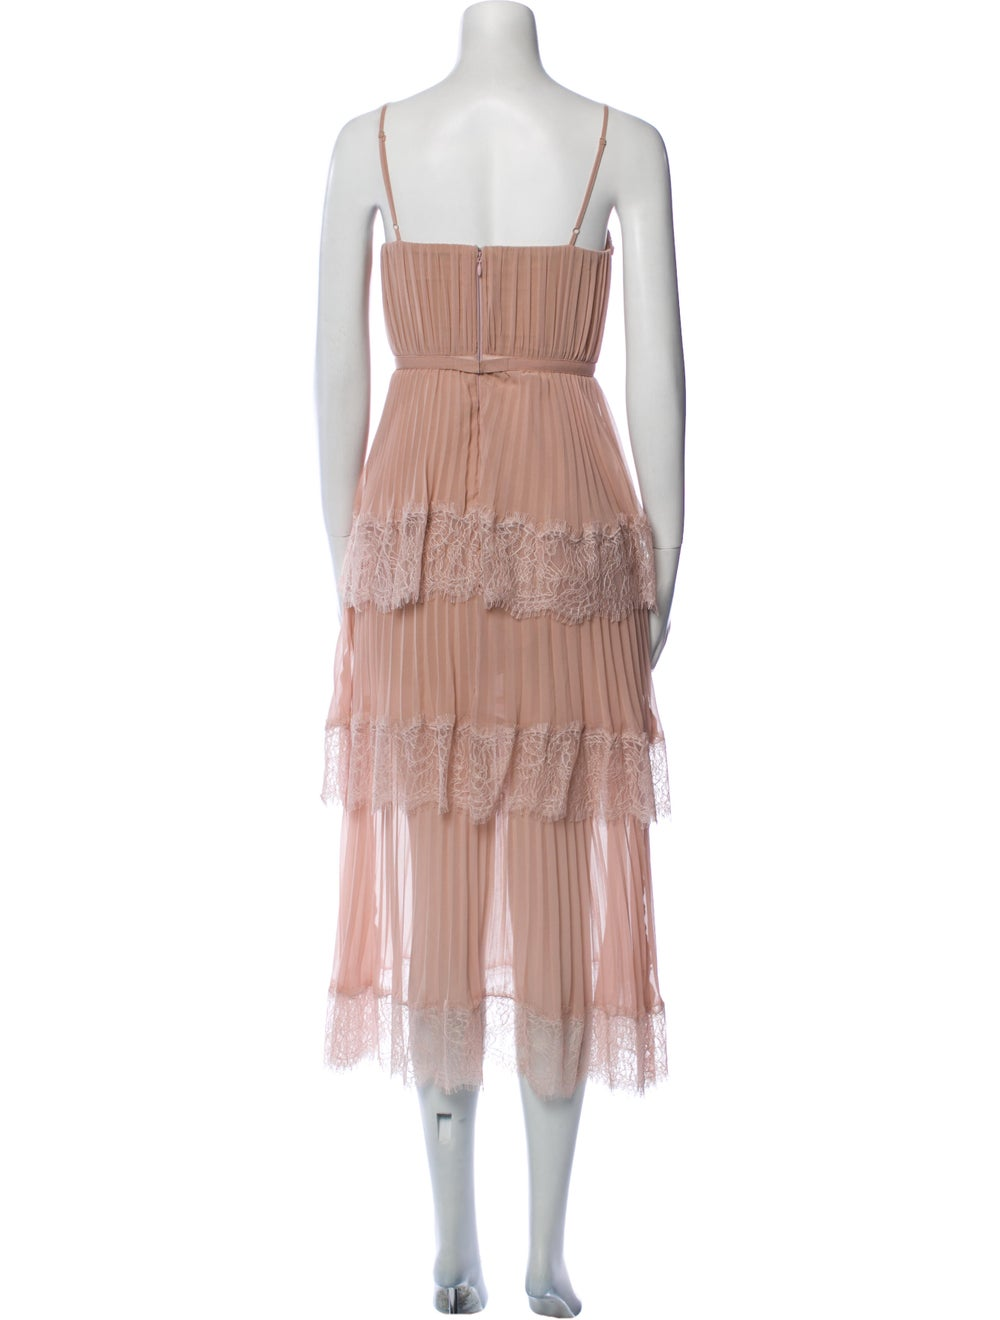 Self-Portrait Square Neckline Long Dress Pink - image 3